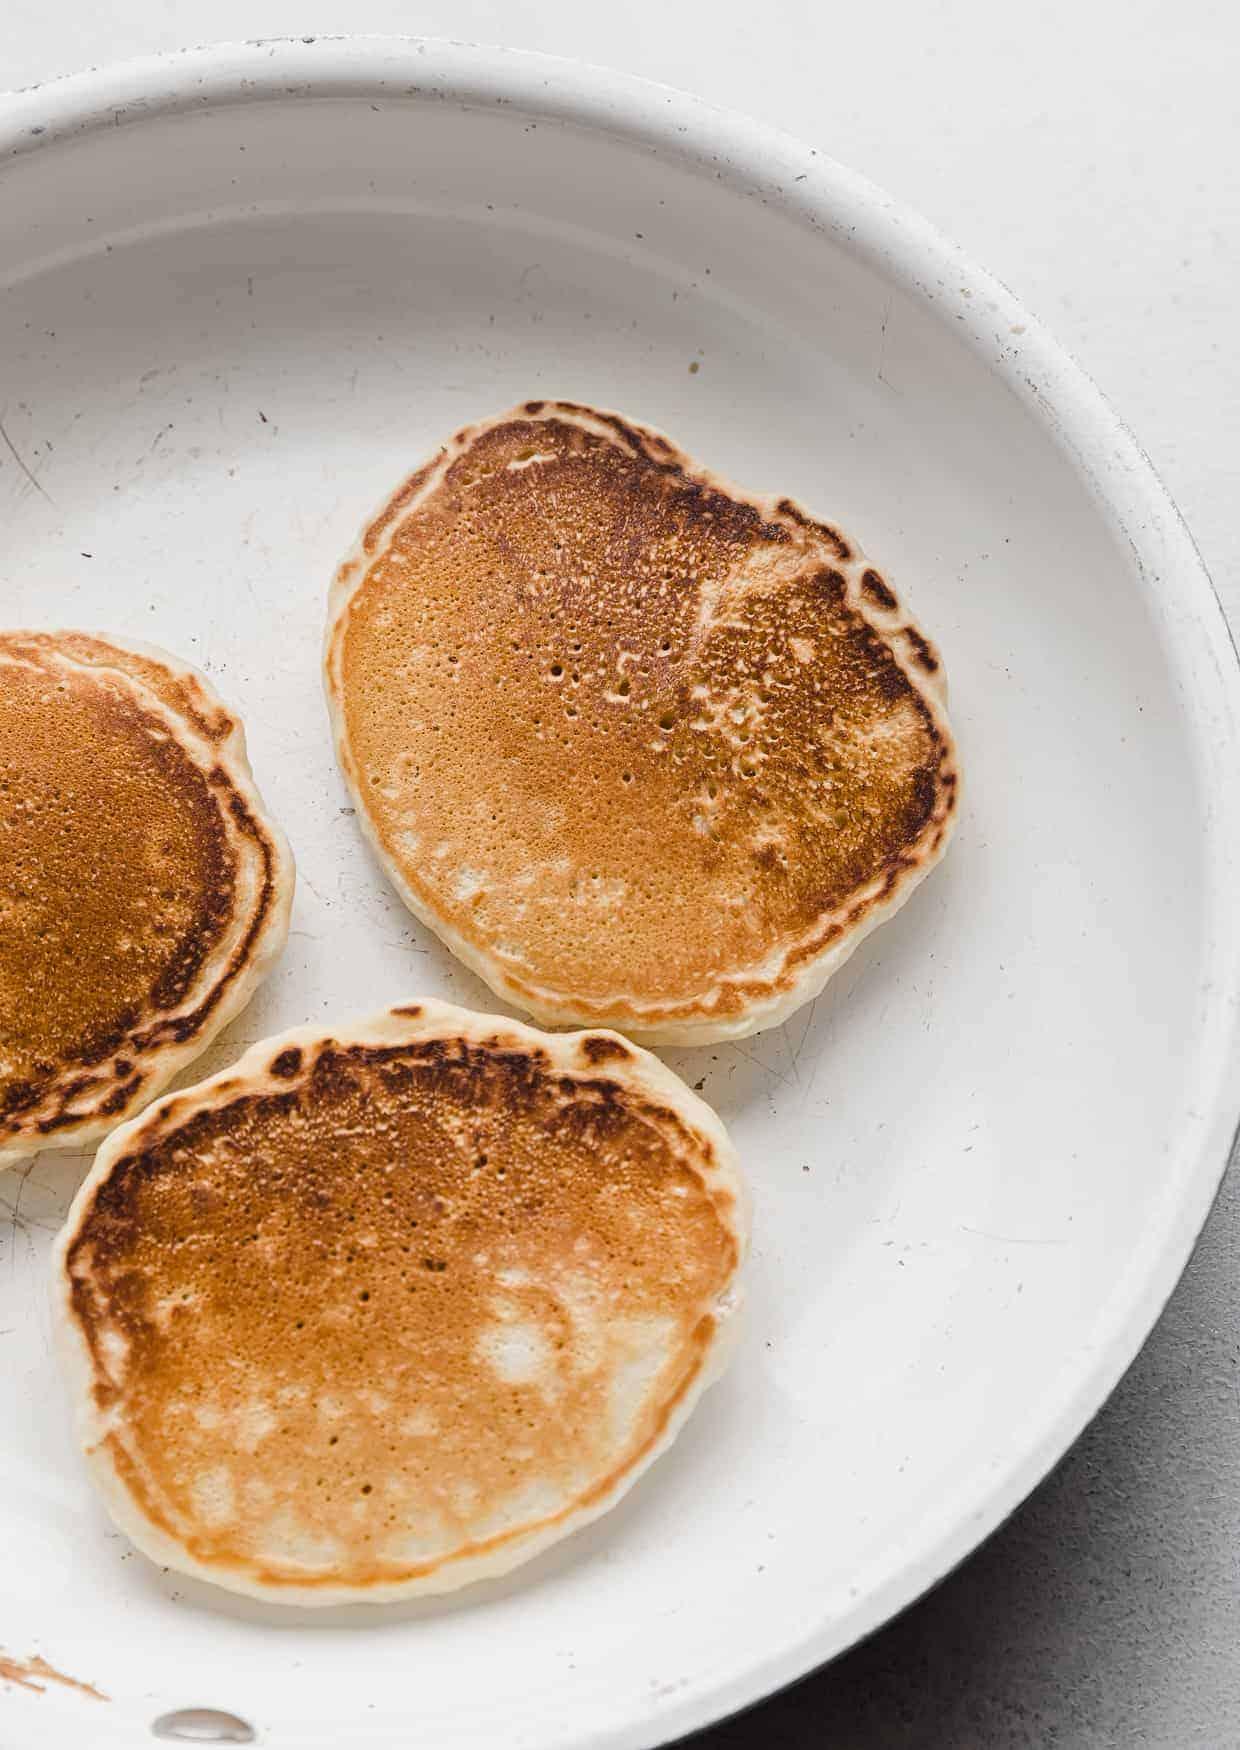 Three golden brown Almond Milk Pancakes in a white skillet.